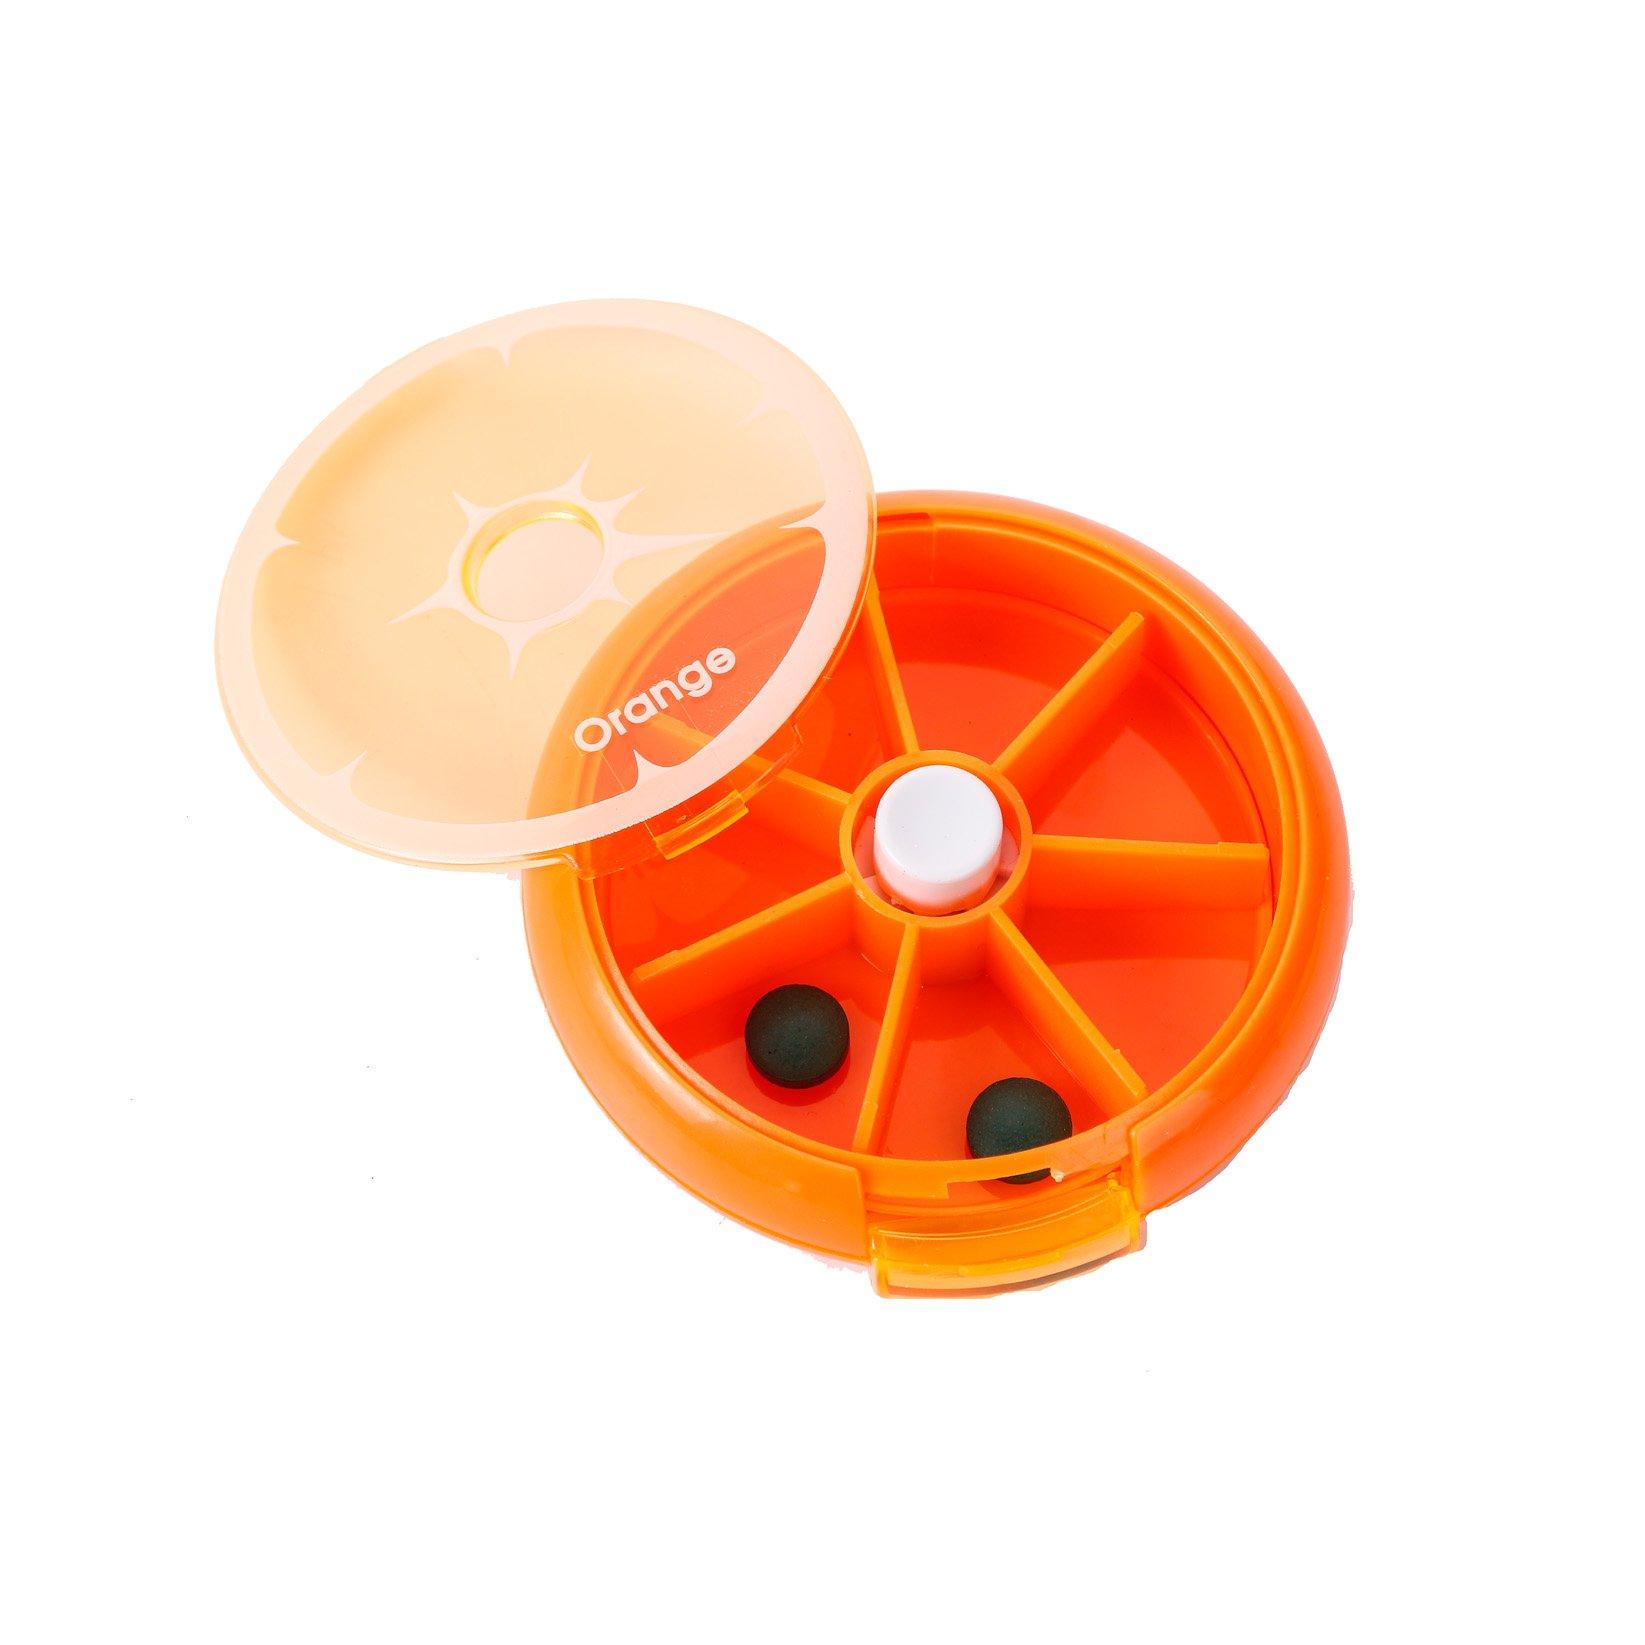 Seven Days Rotate Circle Granule Medicine Storage Box Portable Weekly Health Helper (orange) by Heave